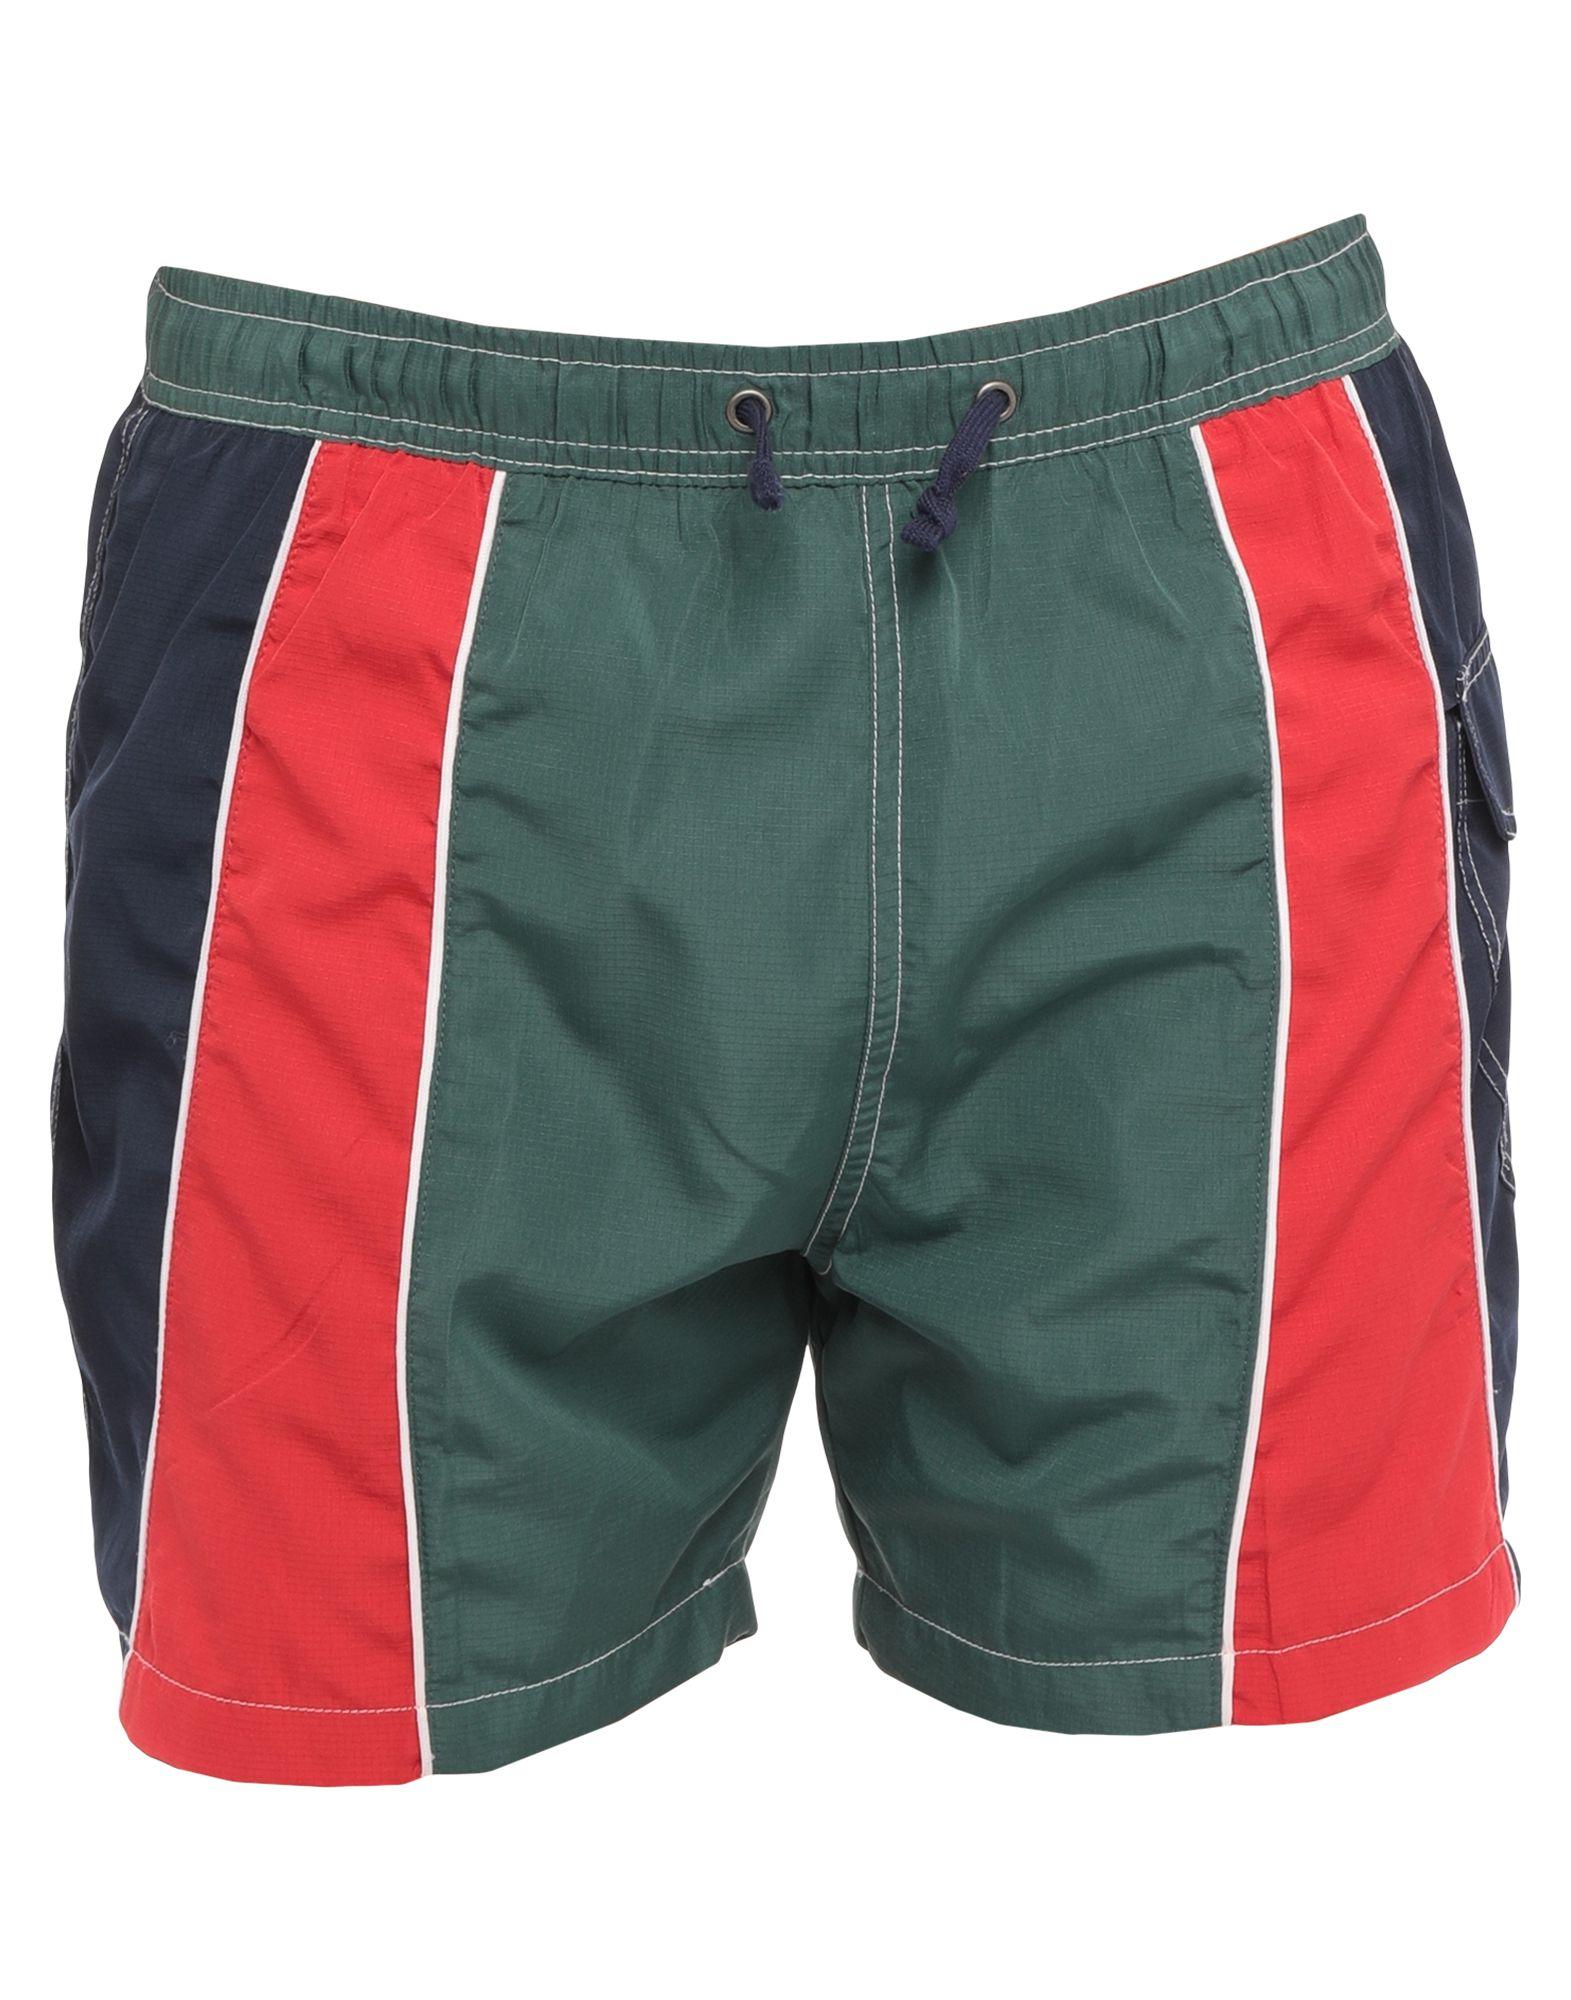 ROBE DI KAPPA Swim trunks - Item 47268265